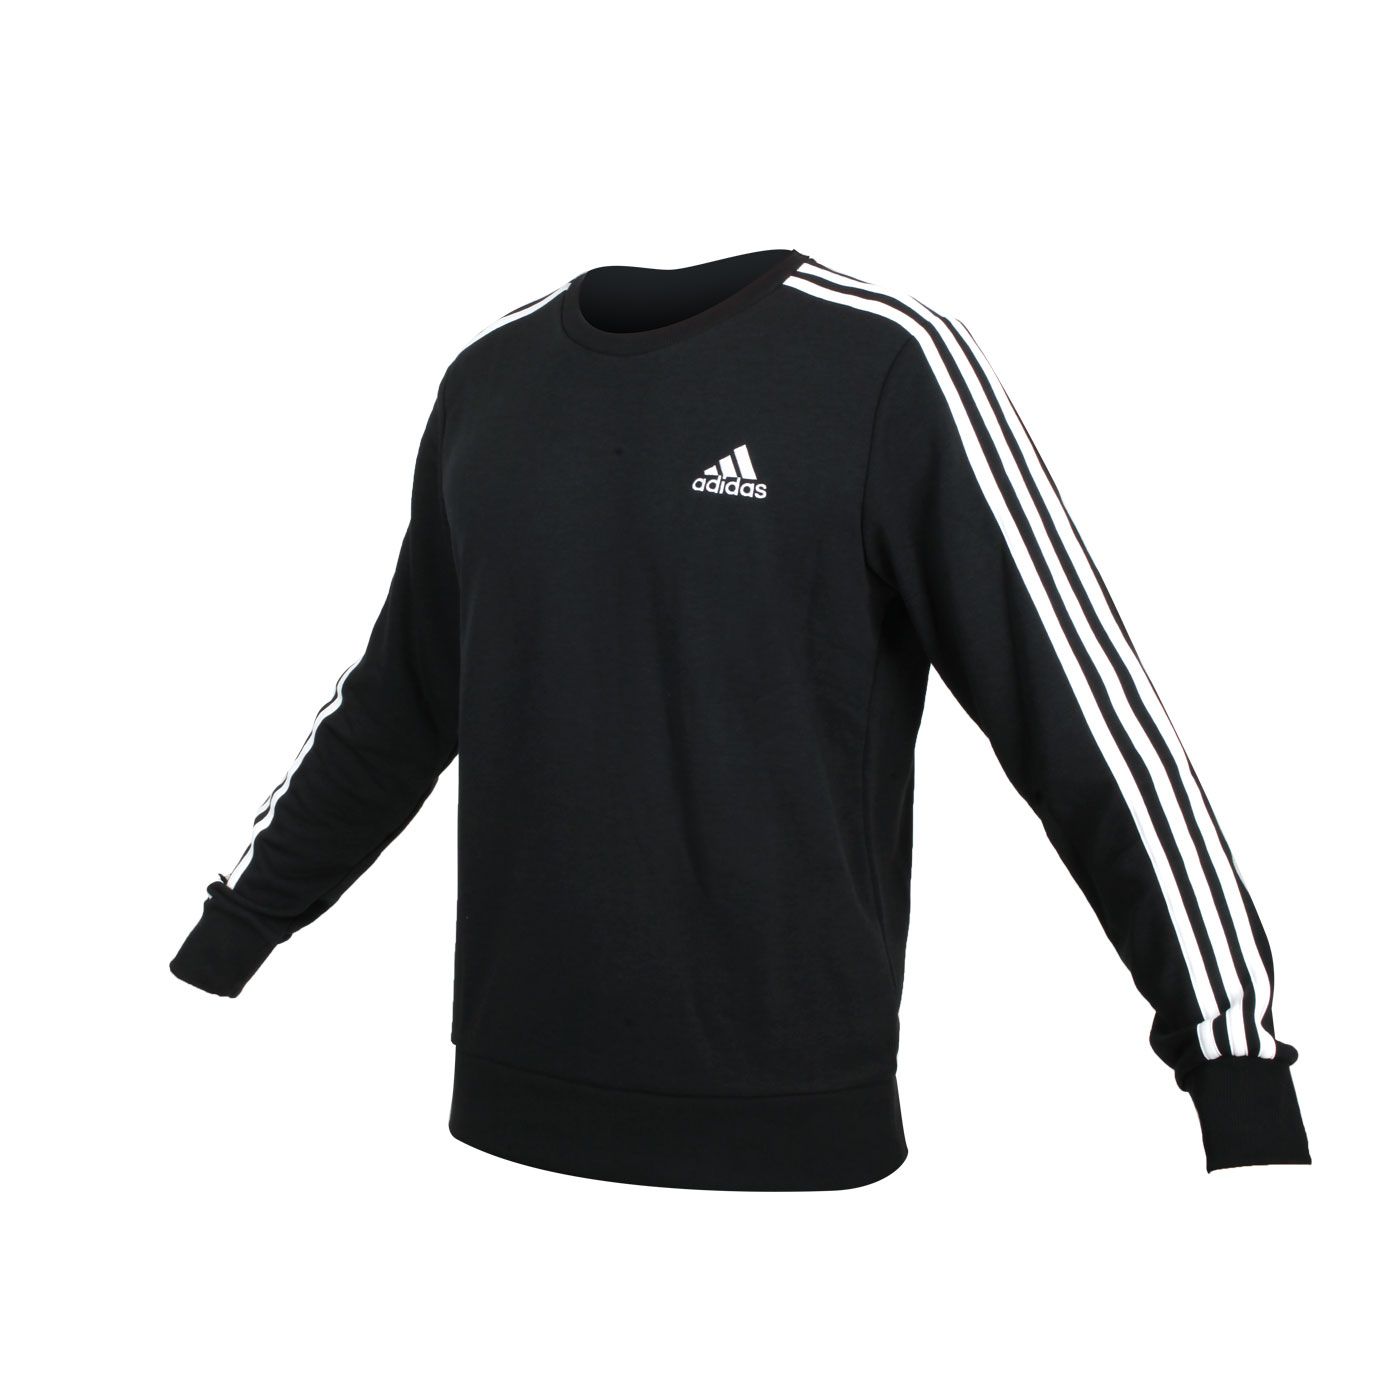 ADIDAS 男款圓領長袖T恤 GK9078 - 黑白